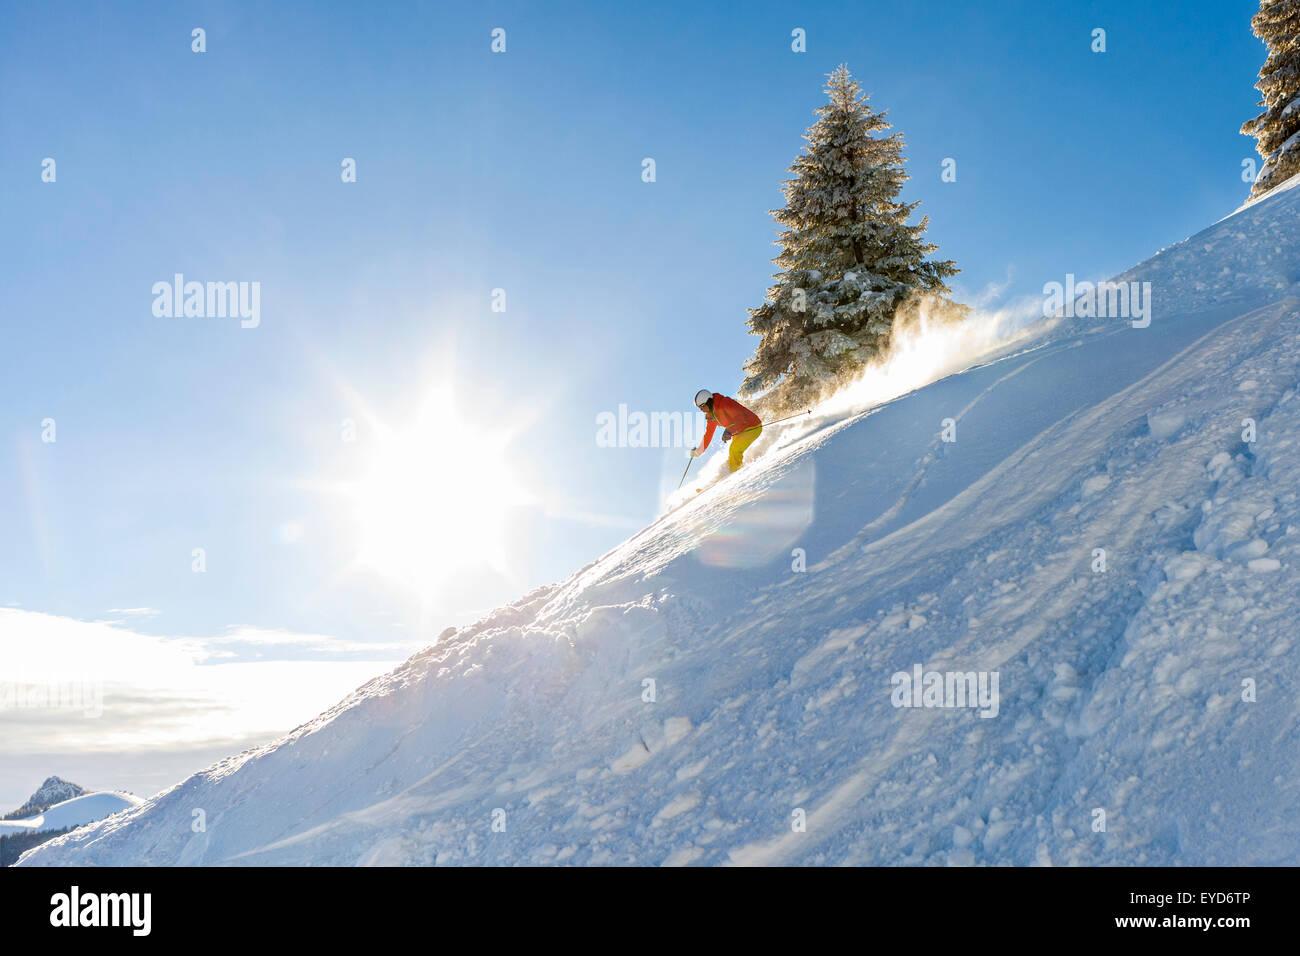 Ski holiday, Woman skiing downhill, Sudelfeld, Bavaria, Germany - Stock Image